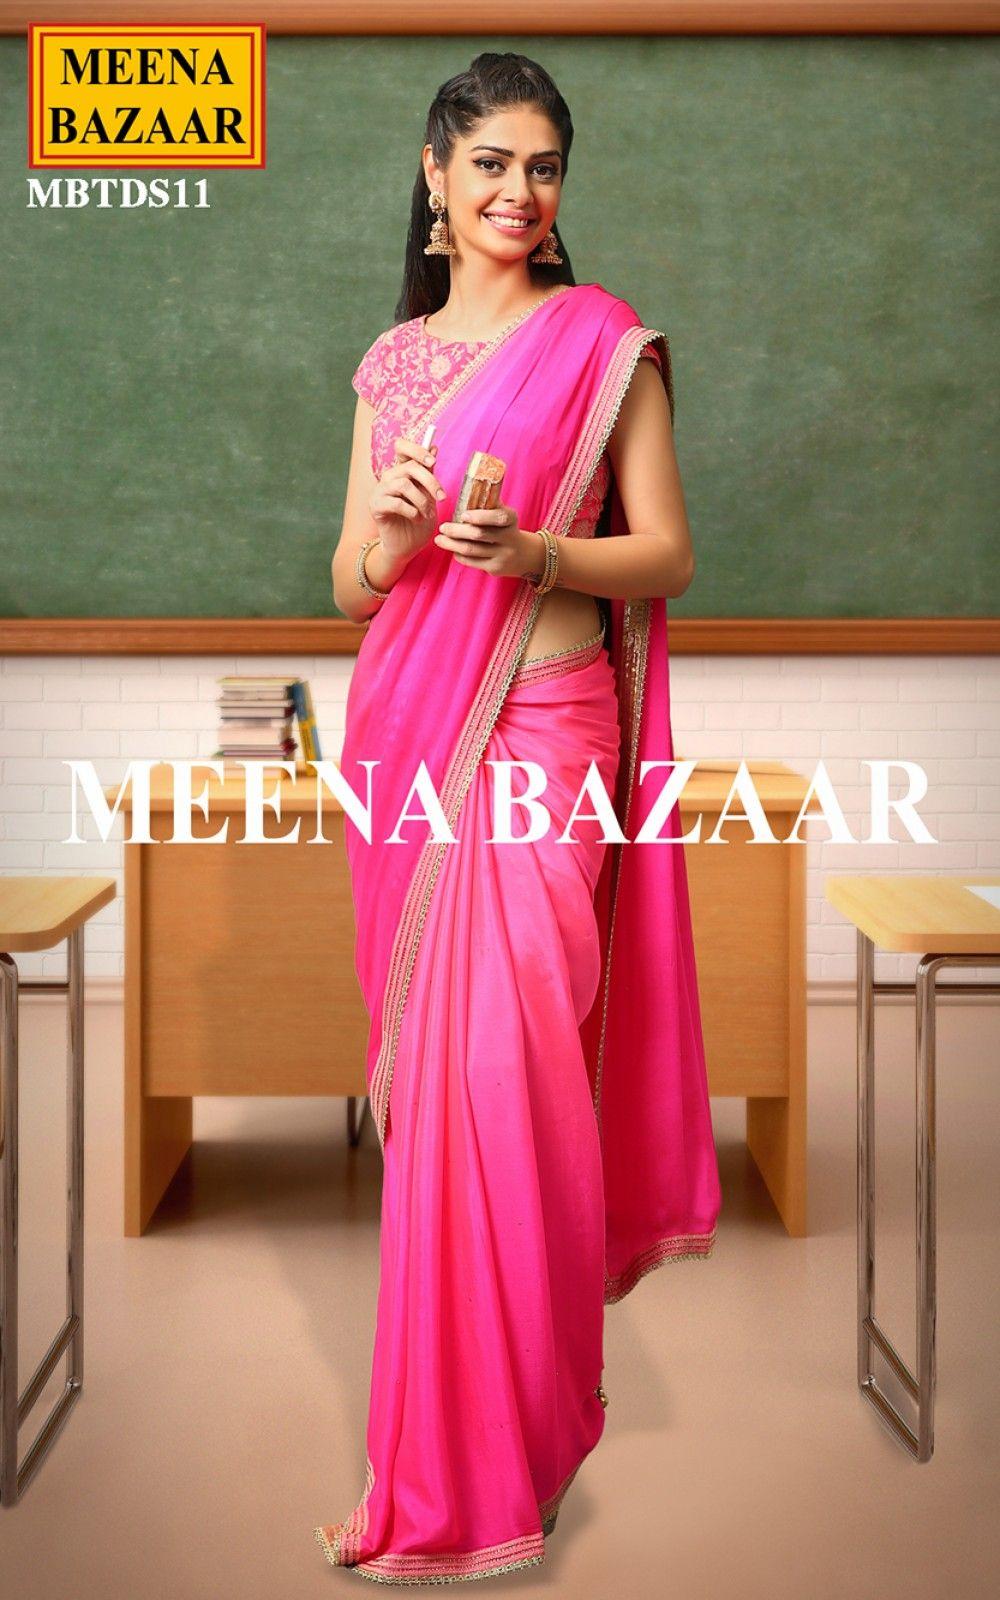 Dresses sarees suits lengha anarkali lehenga pink anarkali lehenga - Pink Chiffon Saree Sarees Online Shopping For Ethnic Wear Buy Designer Sarees Lehengas Chiffon Sareesarees Onlineanarkali Suitsdesigner